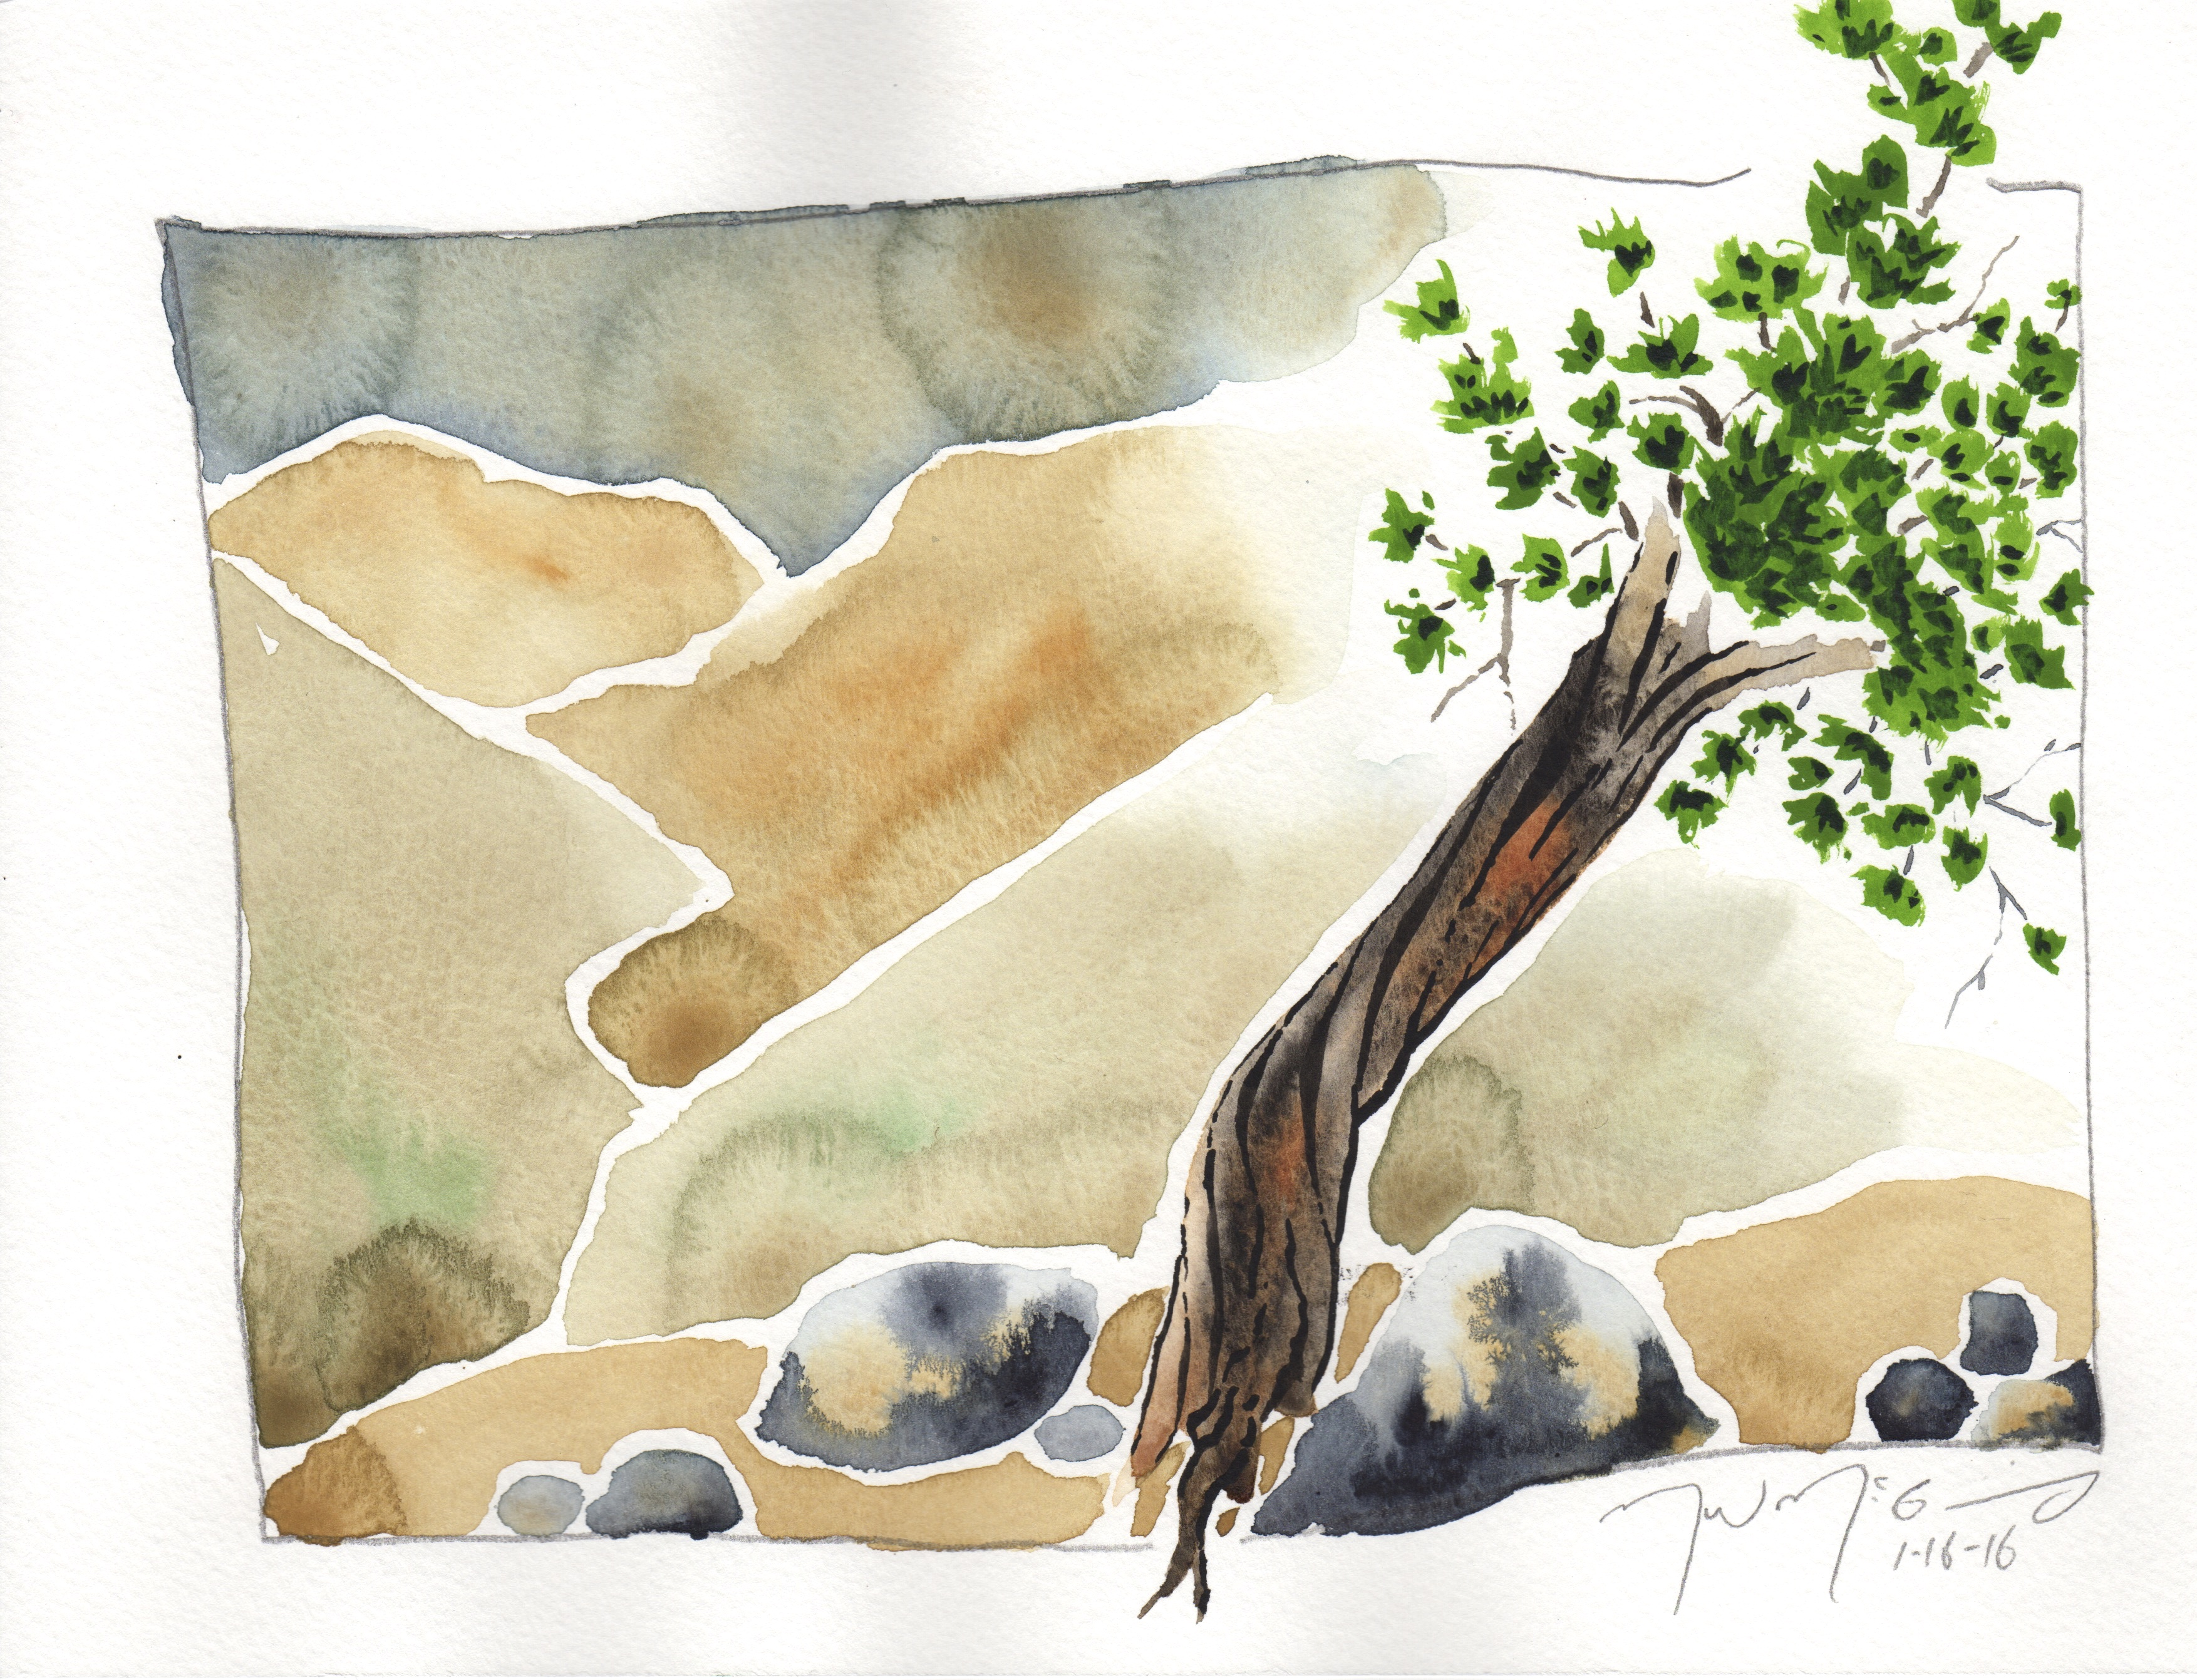 joshua tree 2016 - 6.jpg